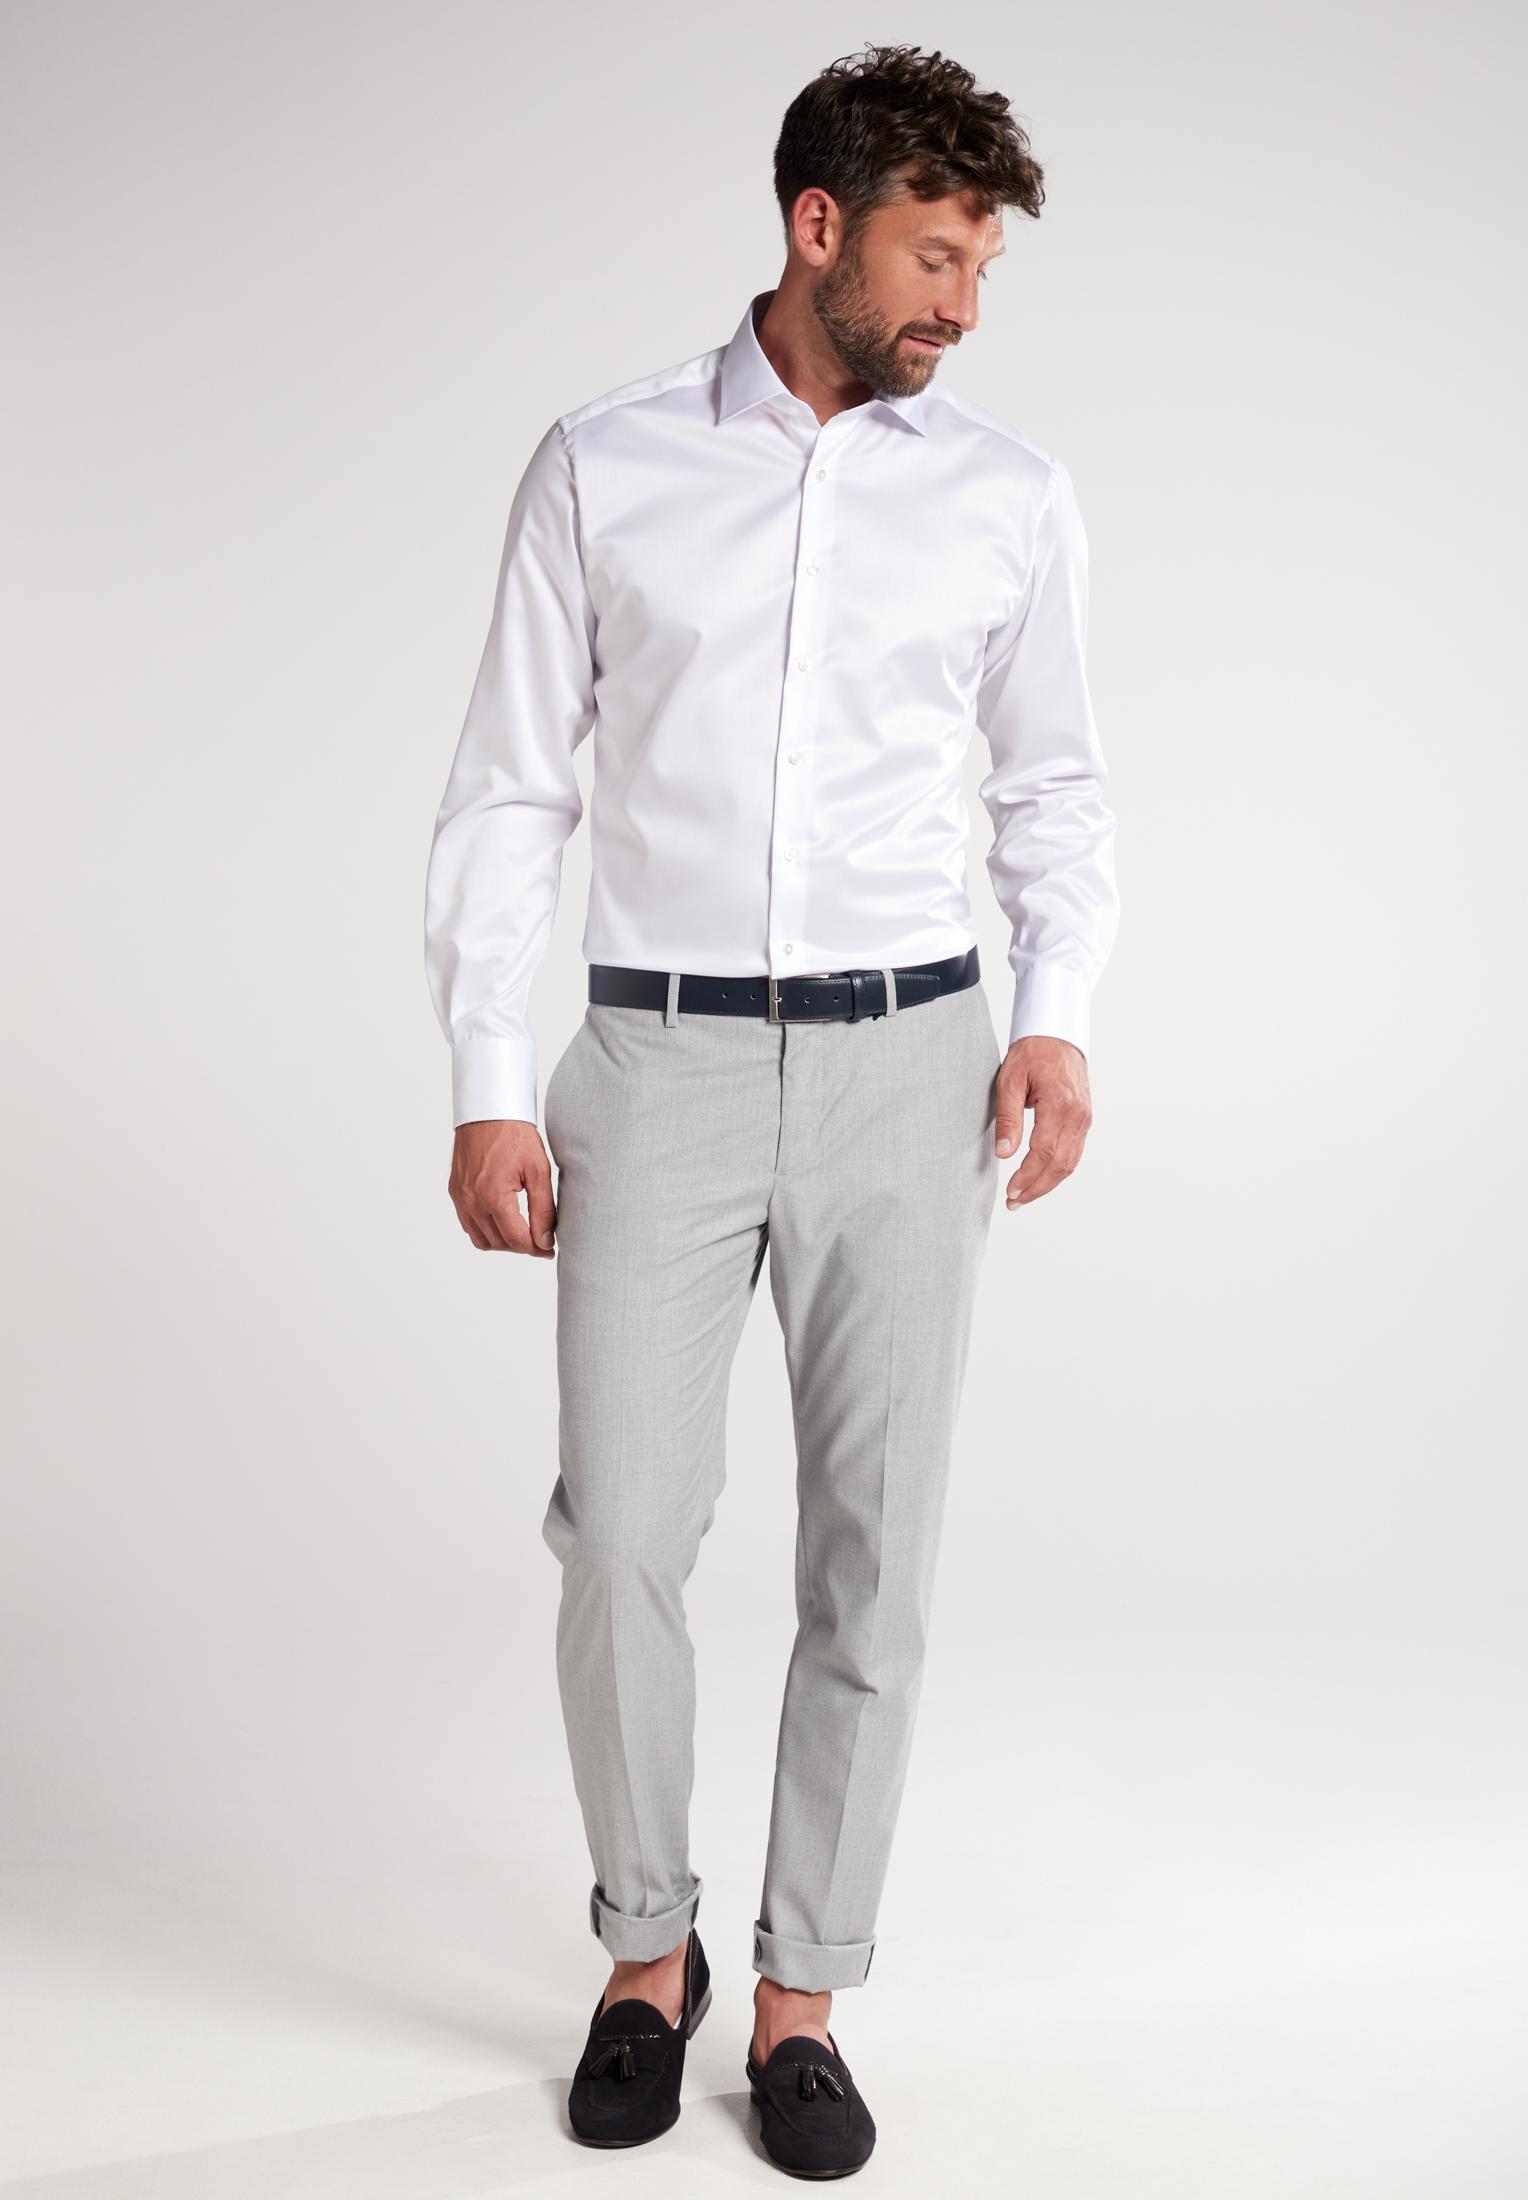 ETERNA Langarm Hemd einfarbig Twill Modern Fit